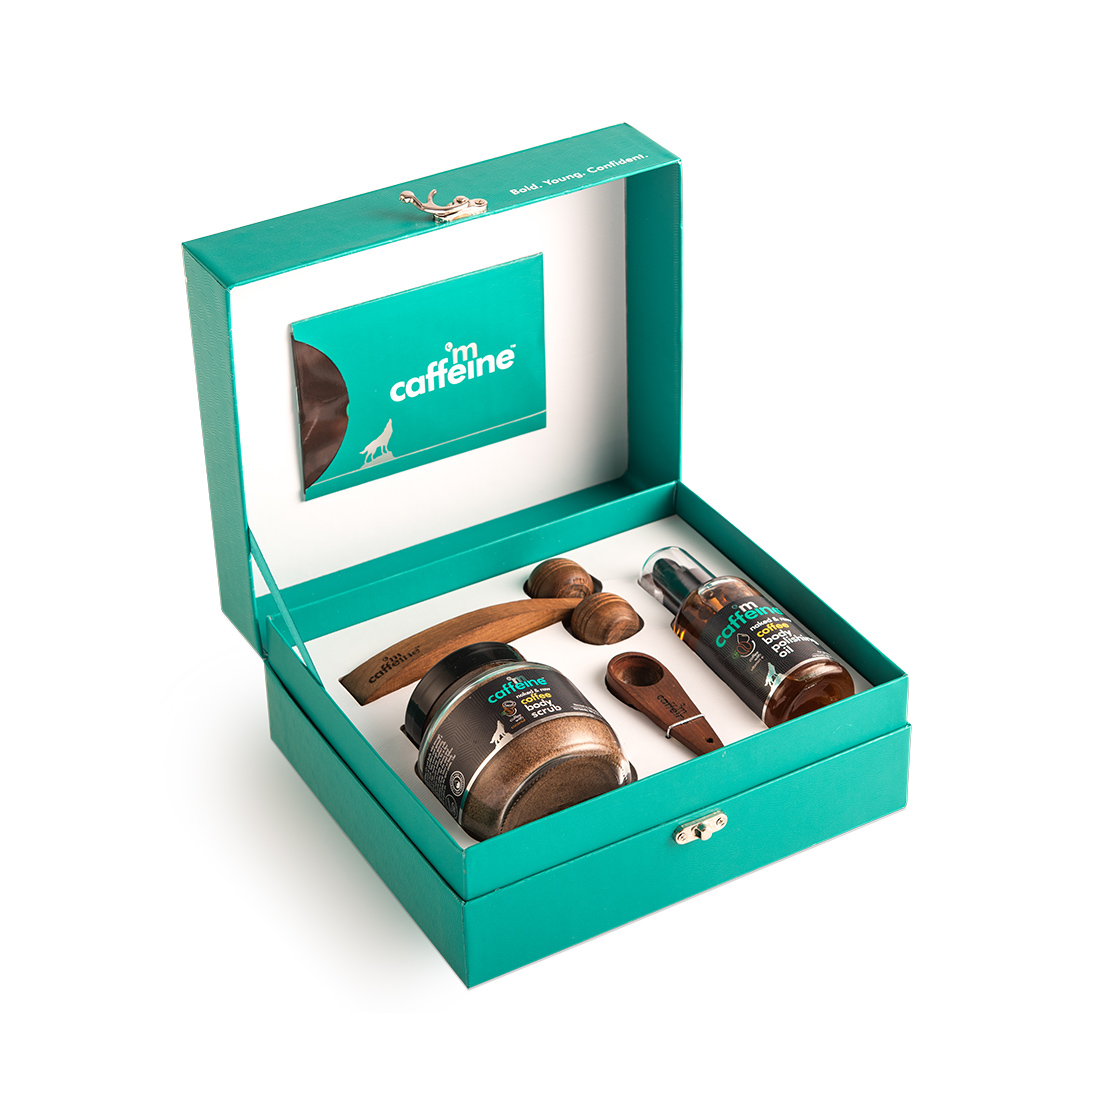 MCaffeine | mCaffeine Coffee De-Stress Skin Care Gift Kit | Body Scrub, Body Polishing oil